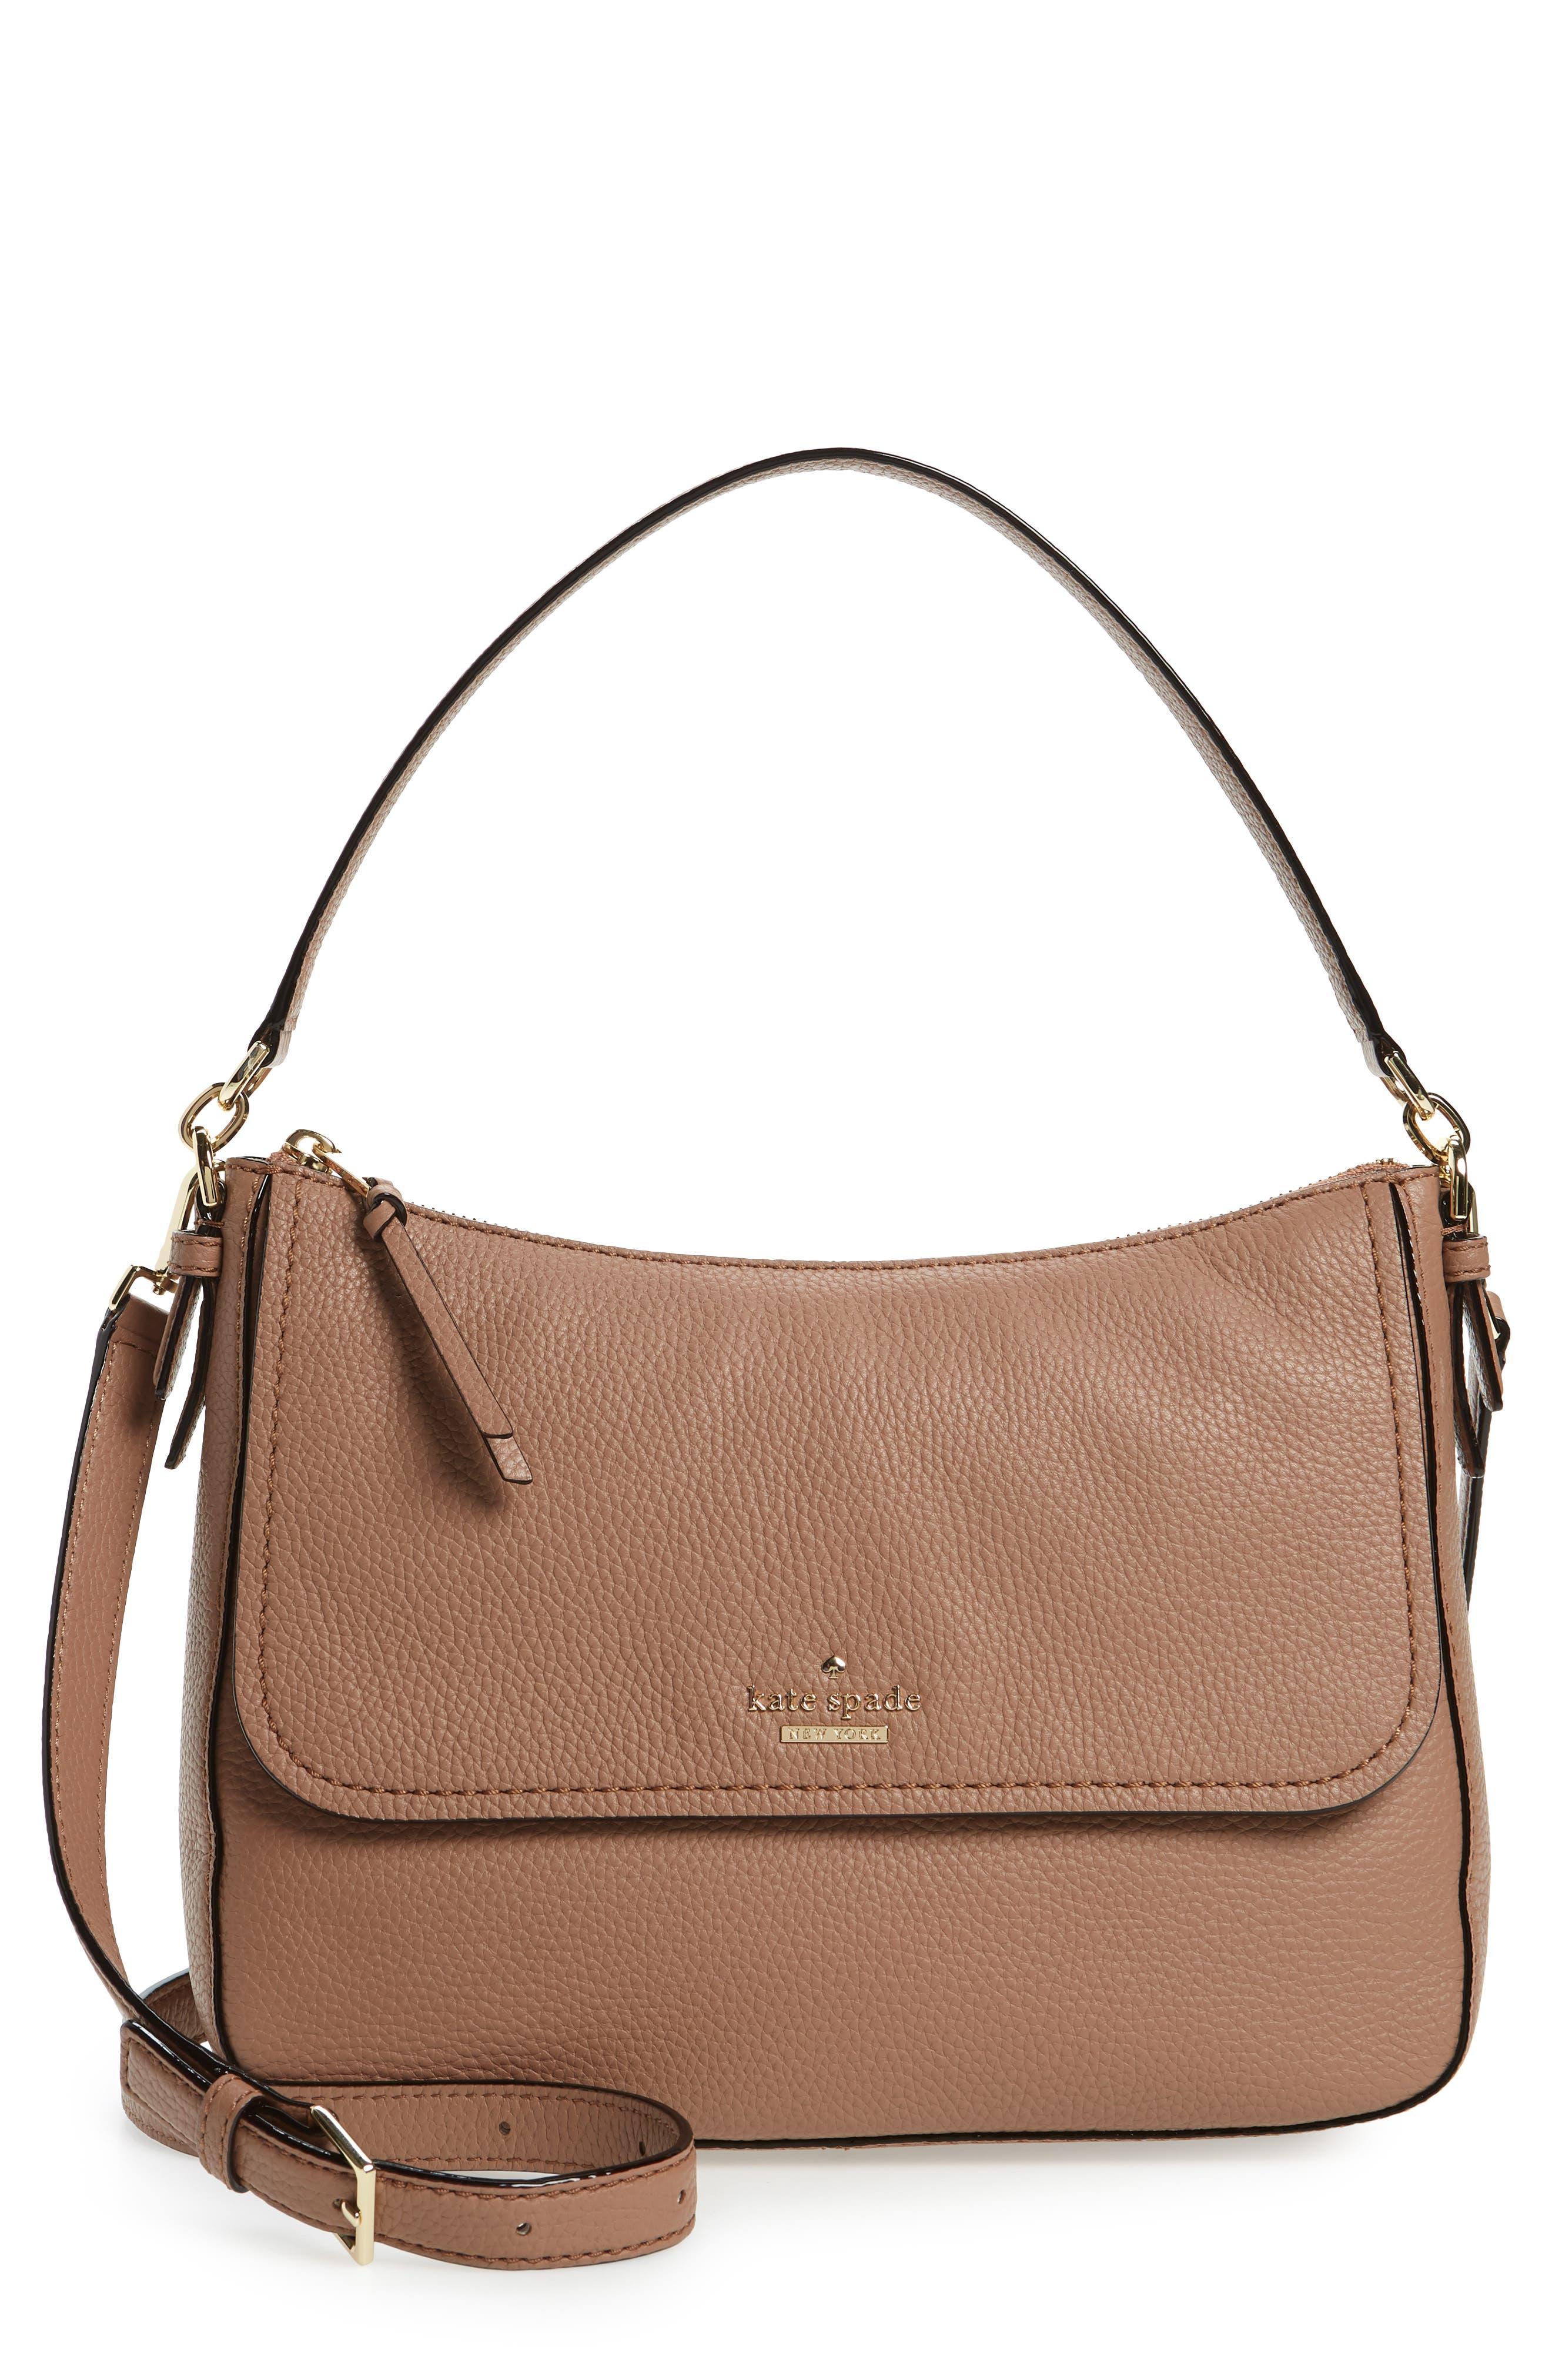 jackson street - colette leather satchel,                             Main thumbnail 1, color,                             Toasty